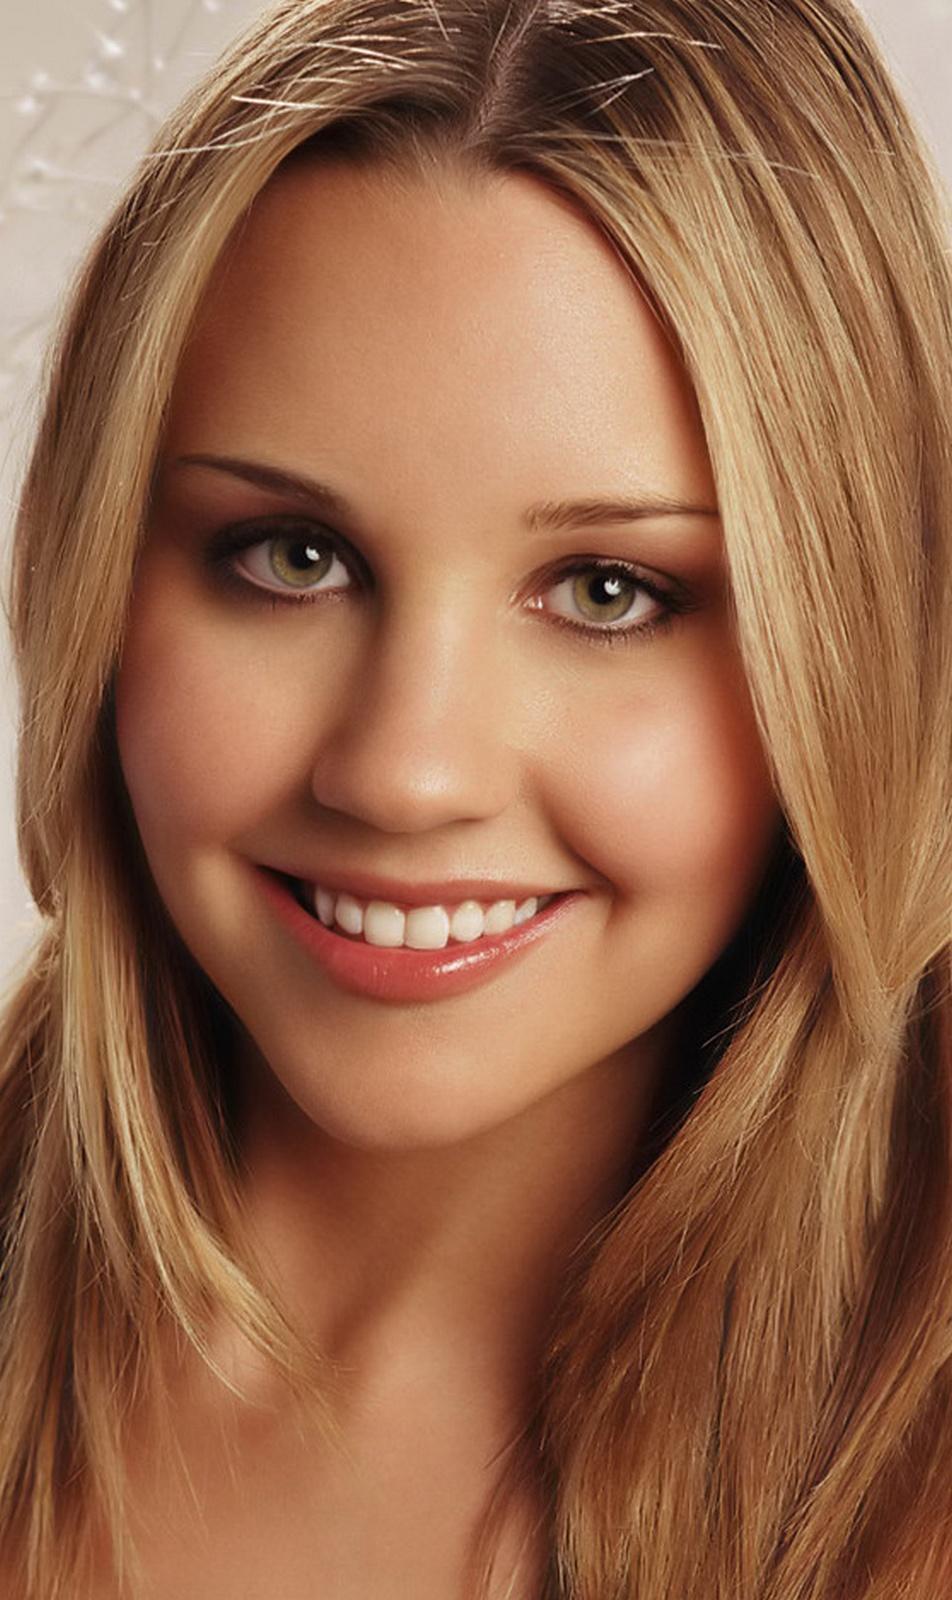 Amanda Laura Bynes